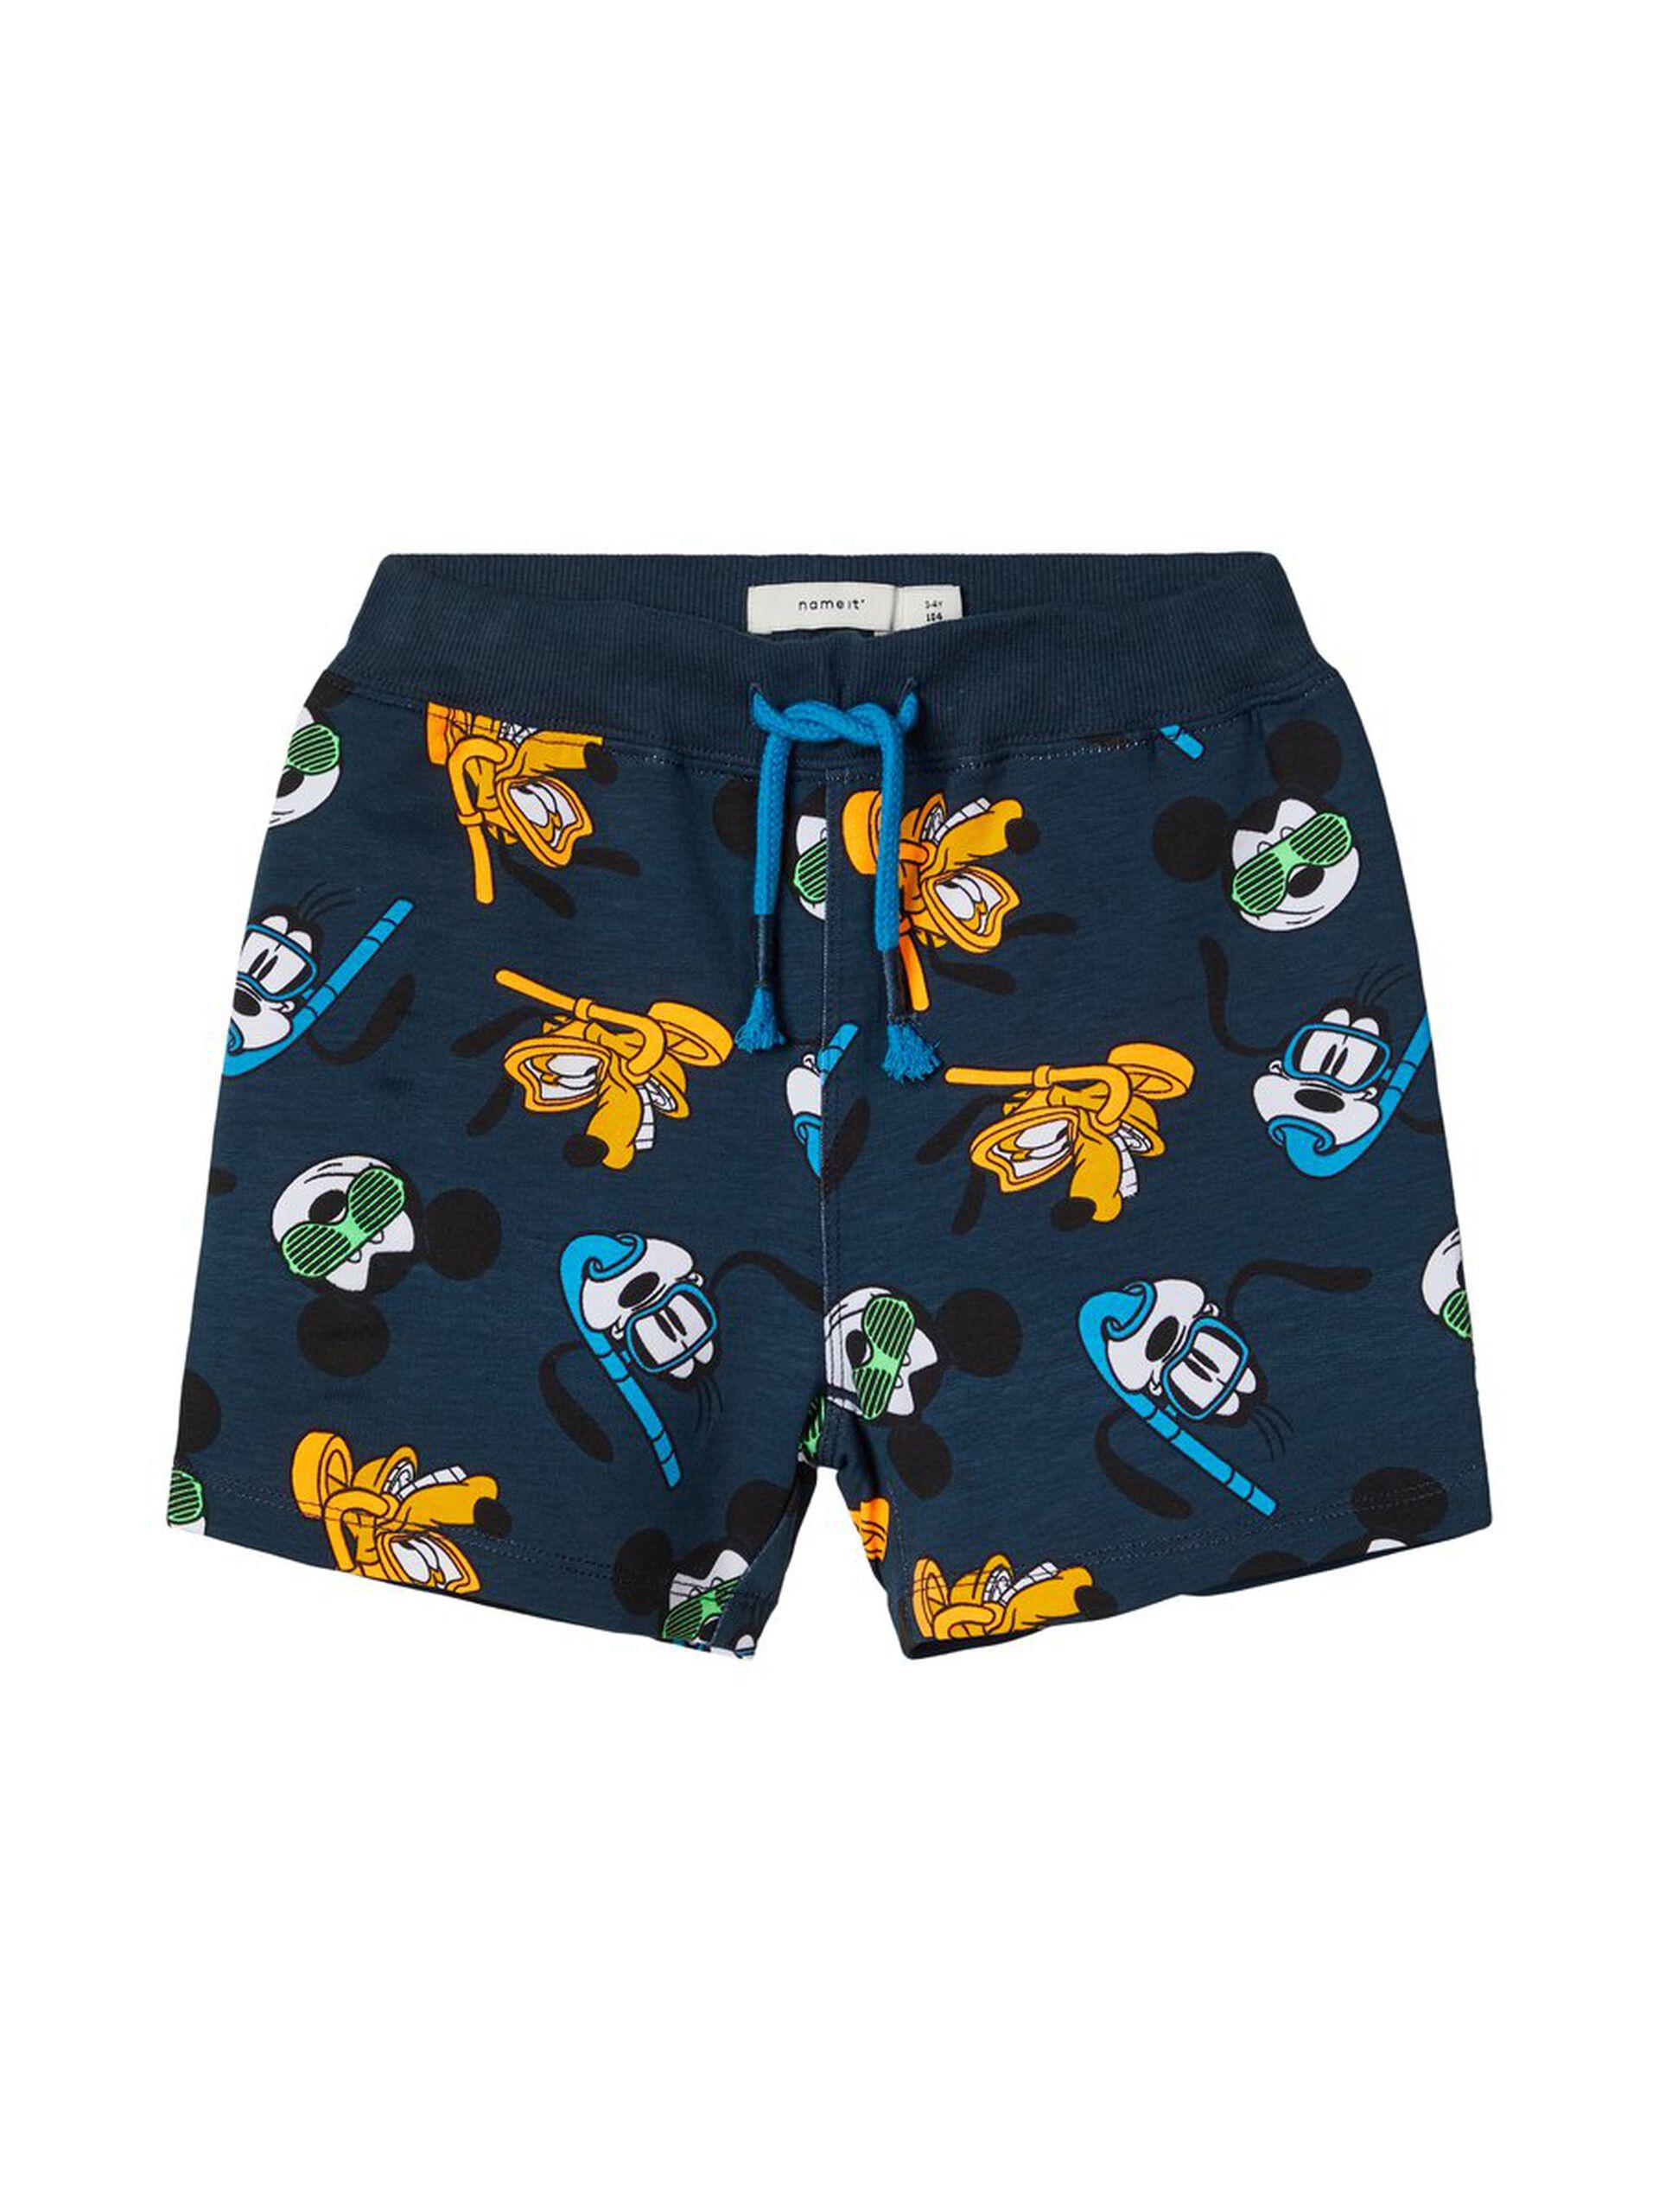 Mikke Mus shorts